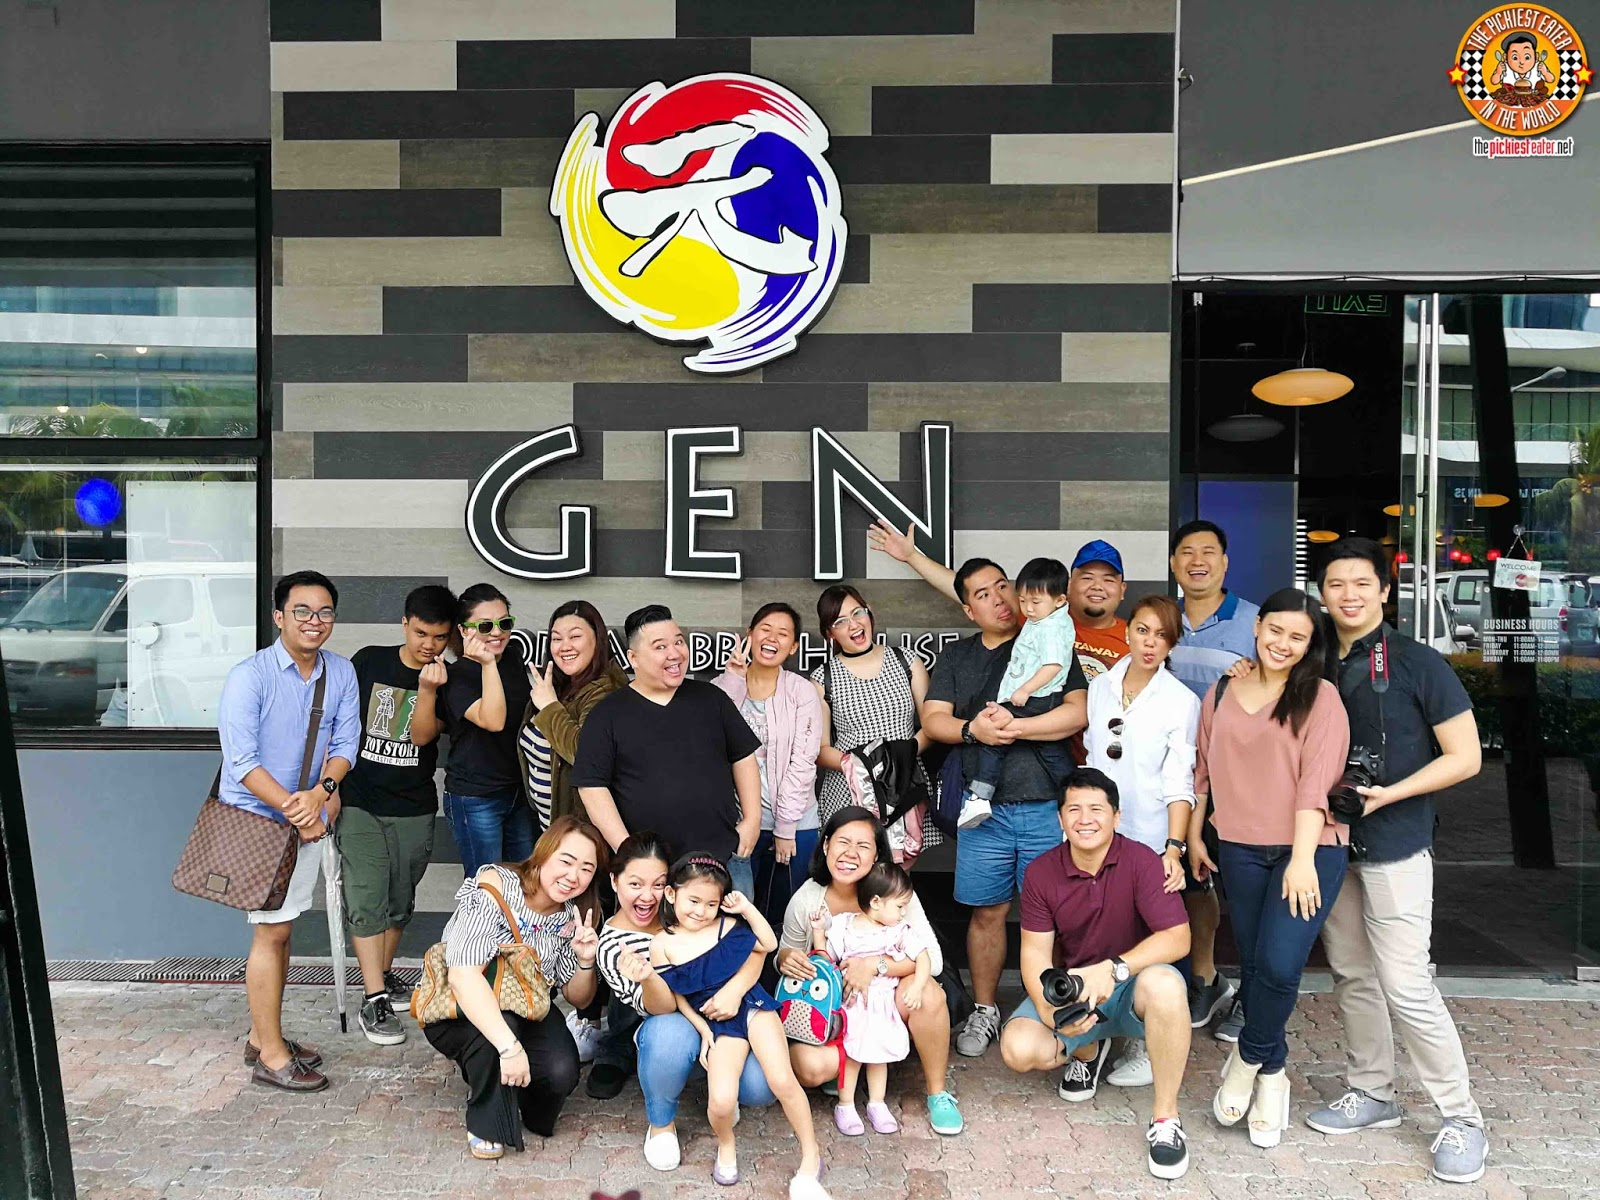 Gen Korean Bbq Menu >> THE PICKIEST EATER IN THE WORLD: FROM CALI TO MANILA: GEN KOREAN BBQ HOUSE